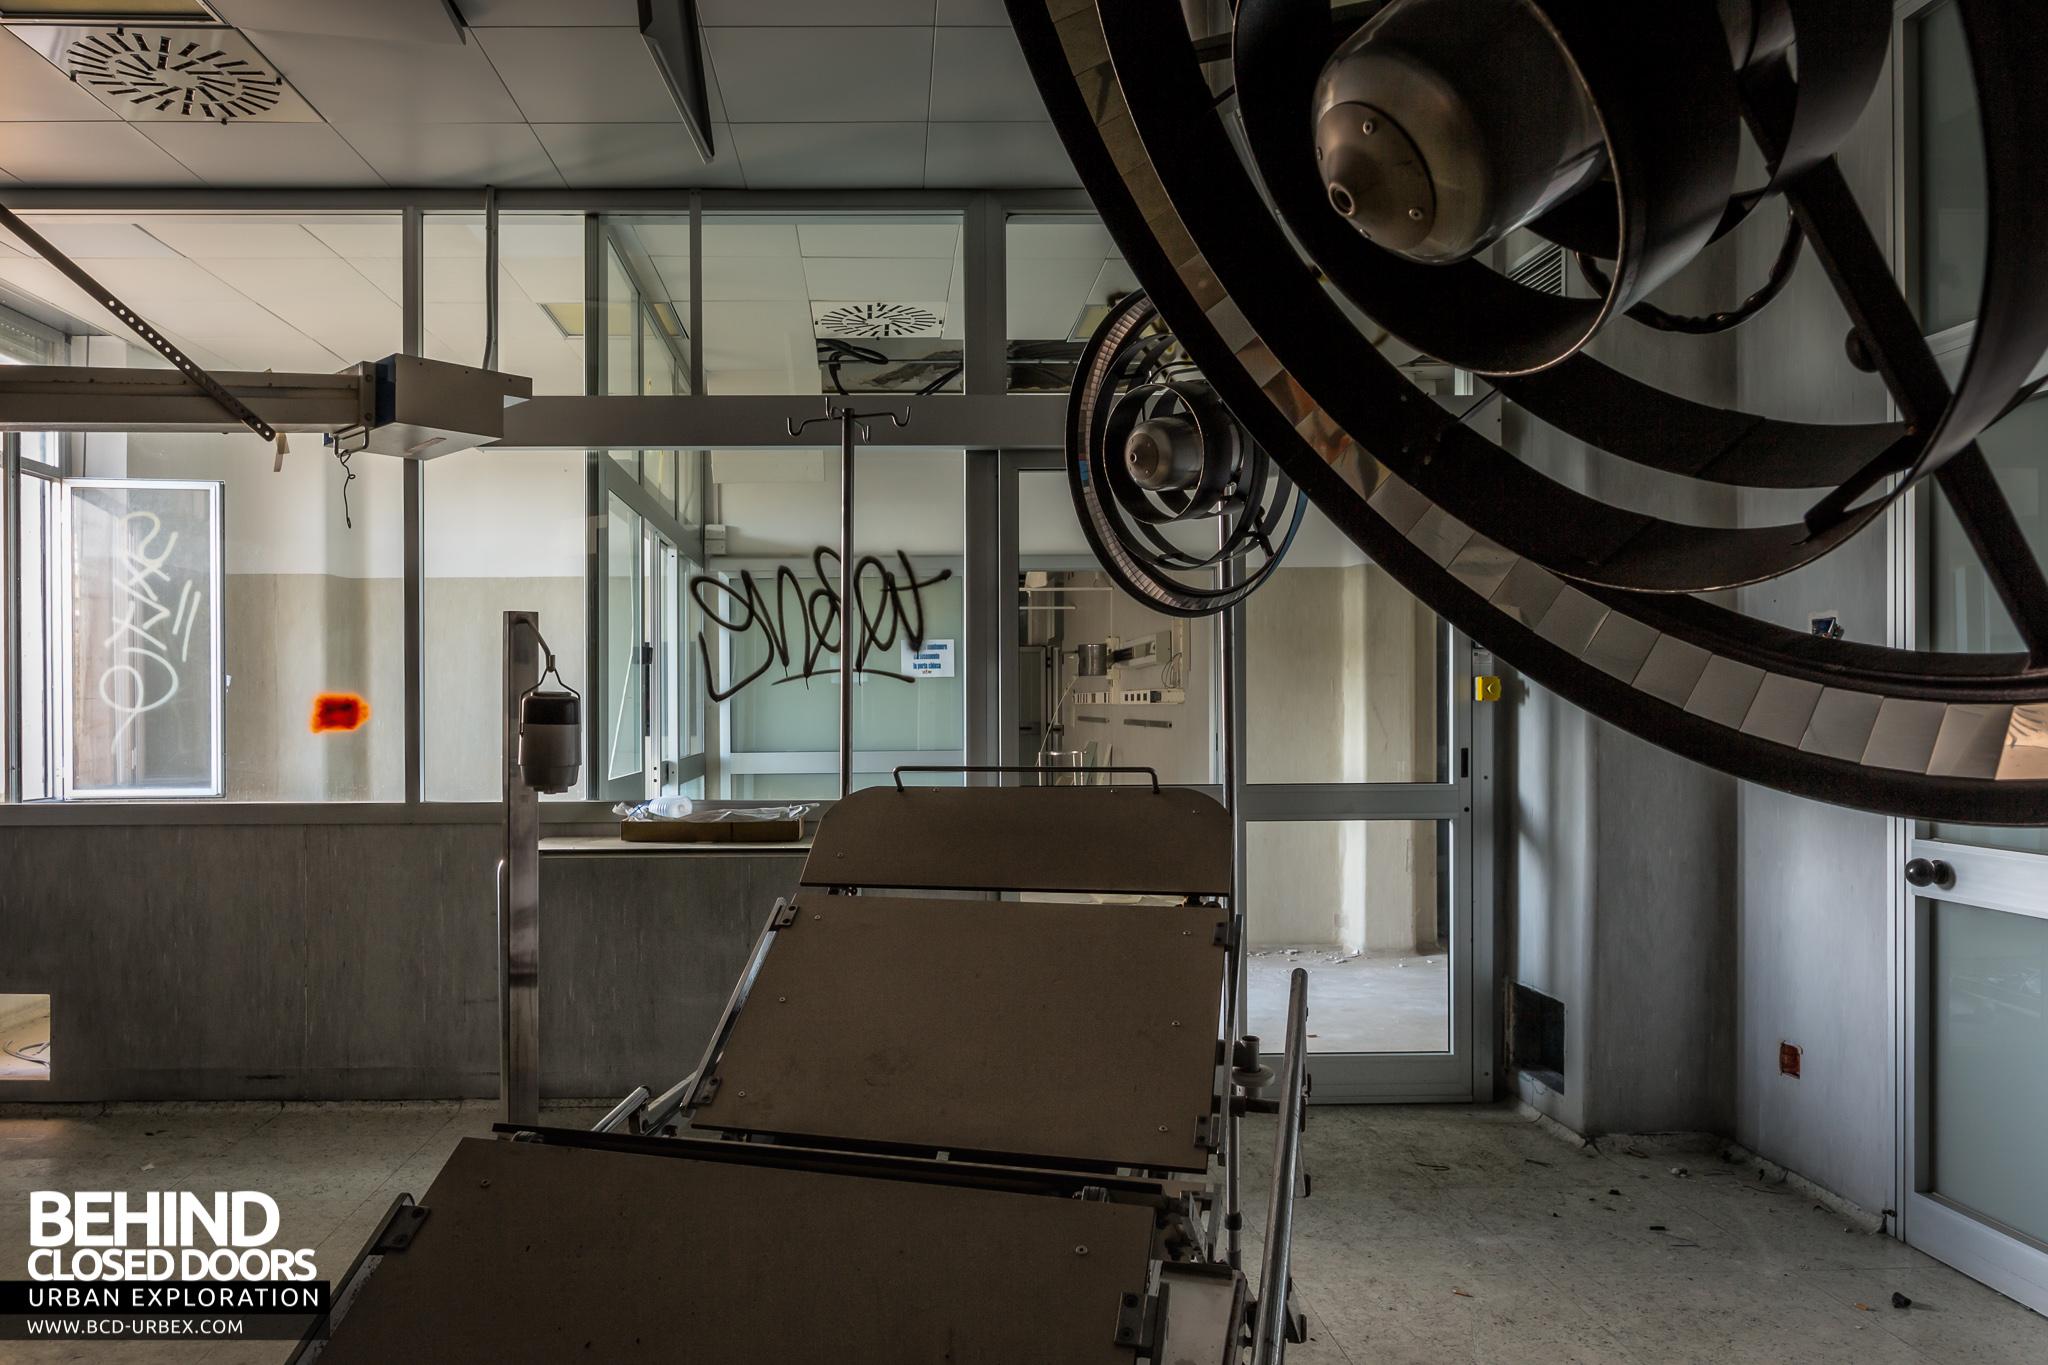 Ospedale SC Abandoned Hospital Italy Urbex